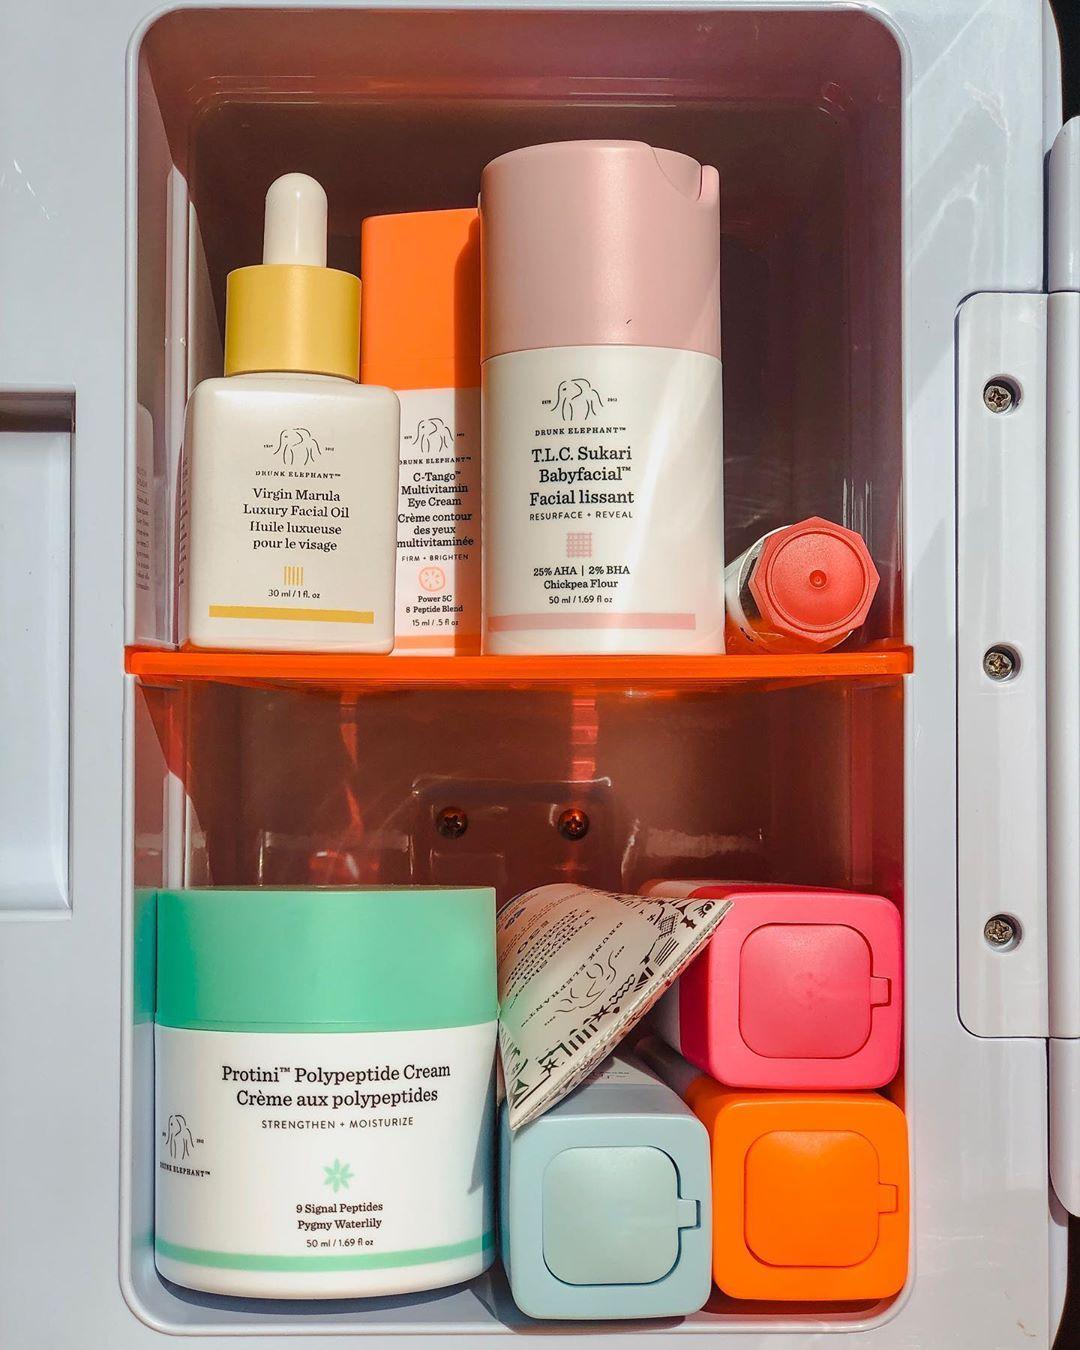 Pin by Mylee on Skin/hair care in 2020 Mini fridge, Skin